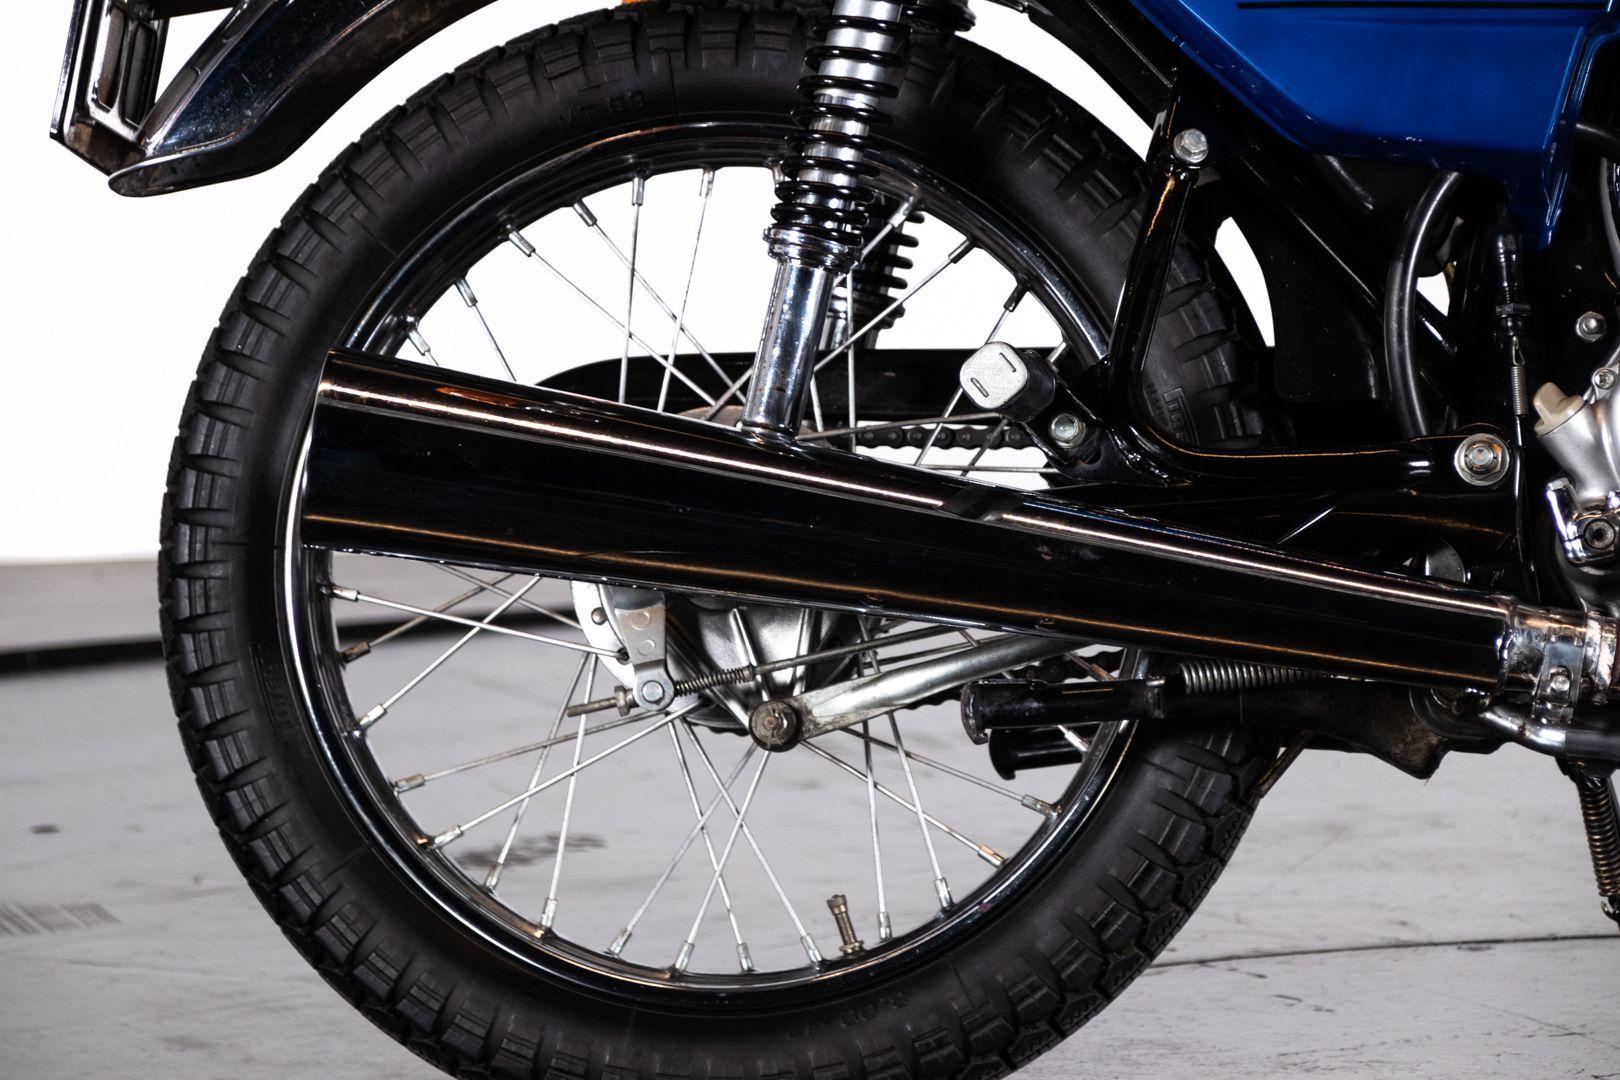 1980 Honda CB 125 7/C 63461